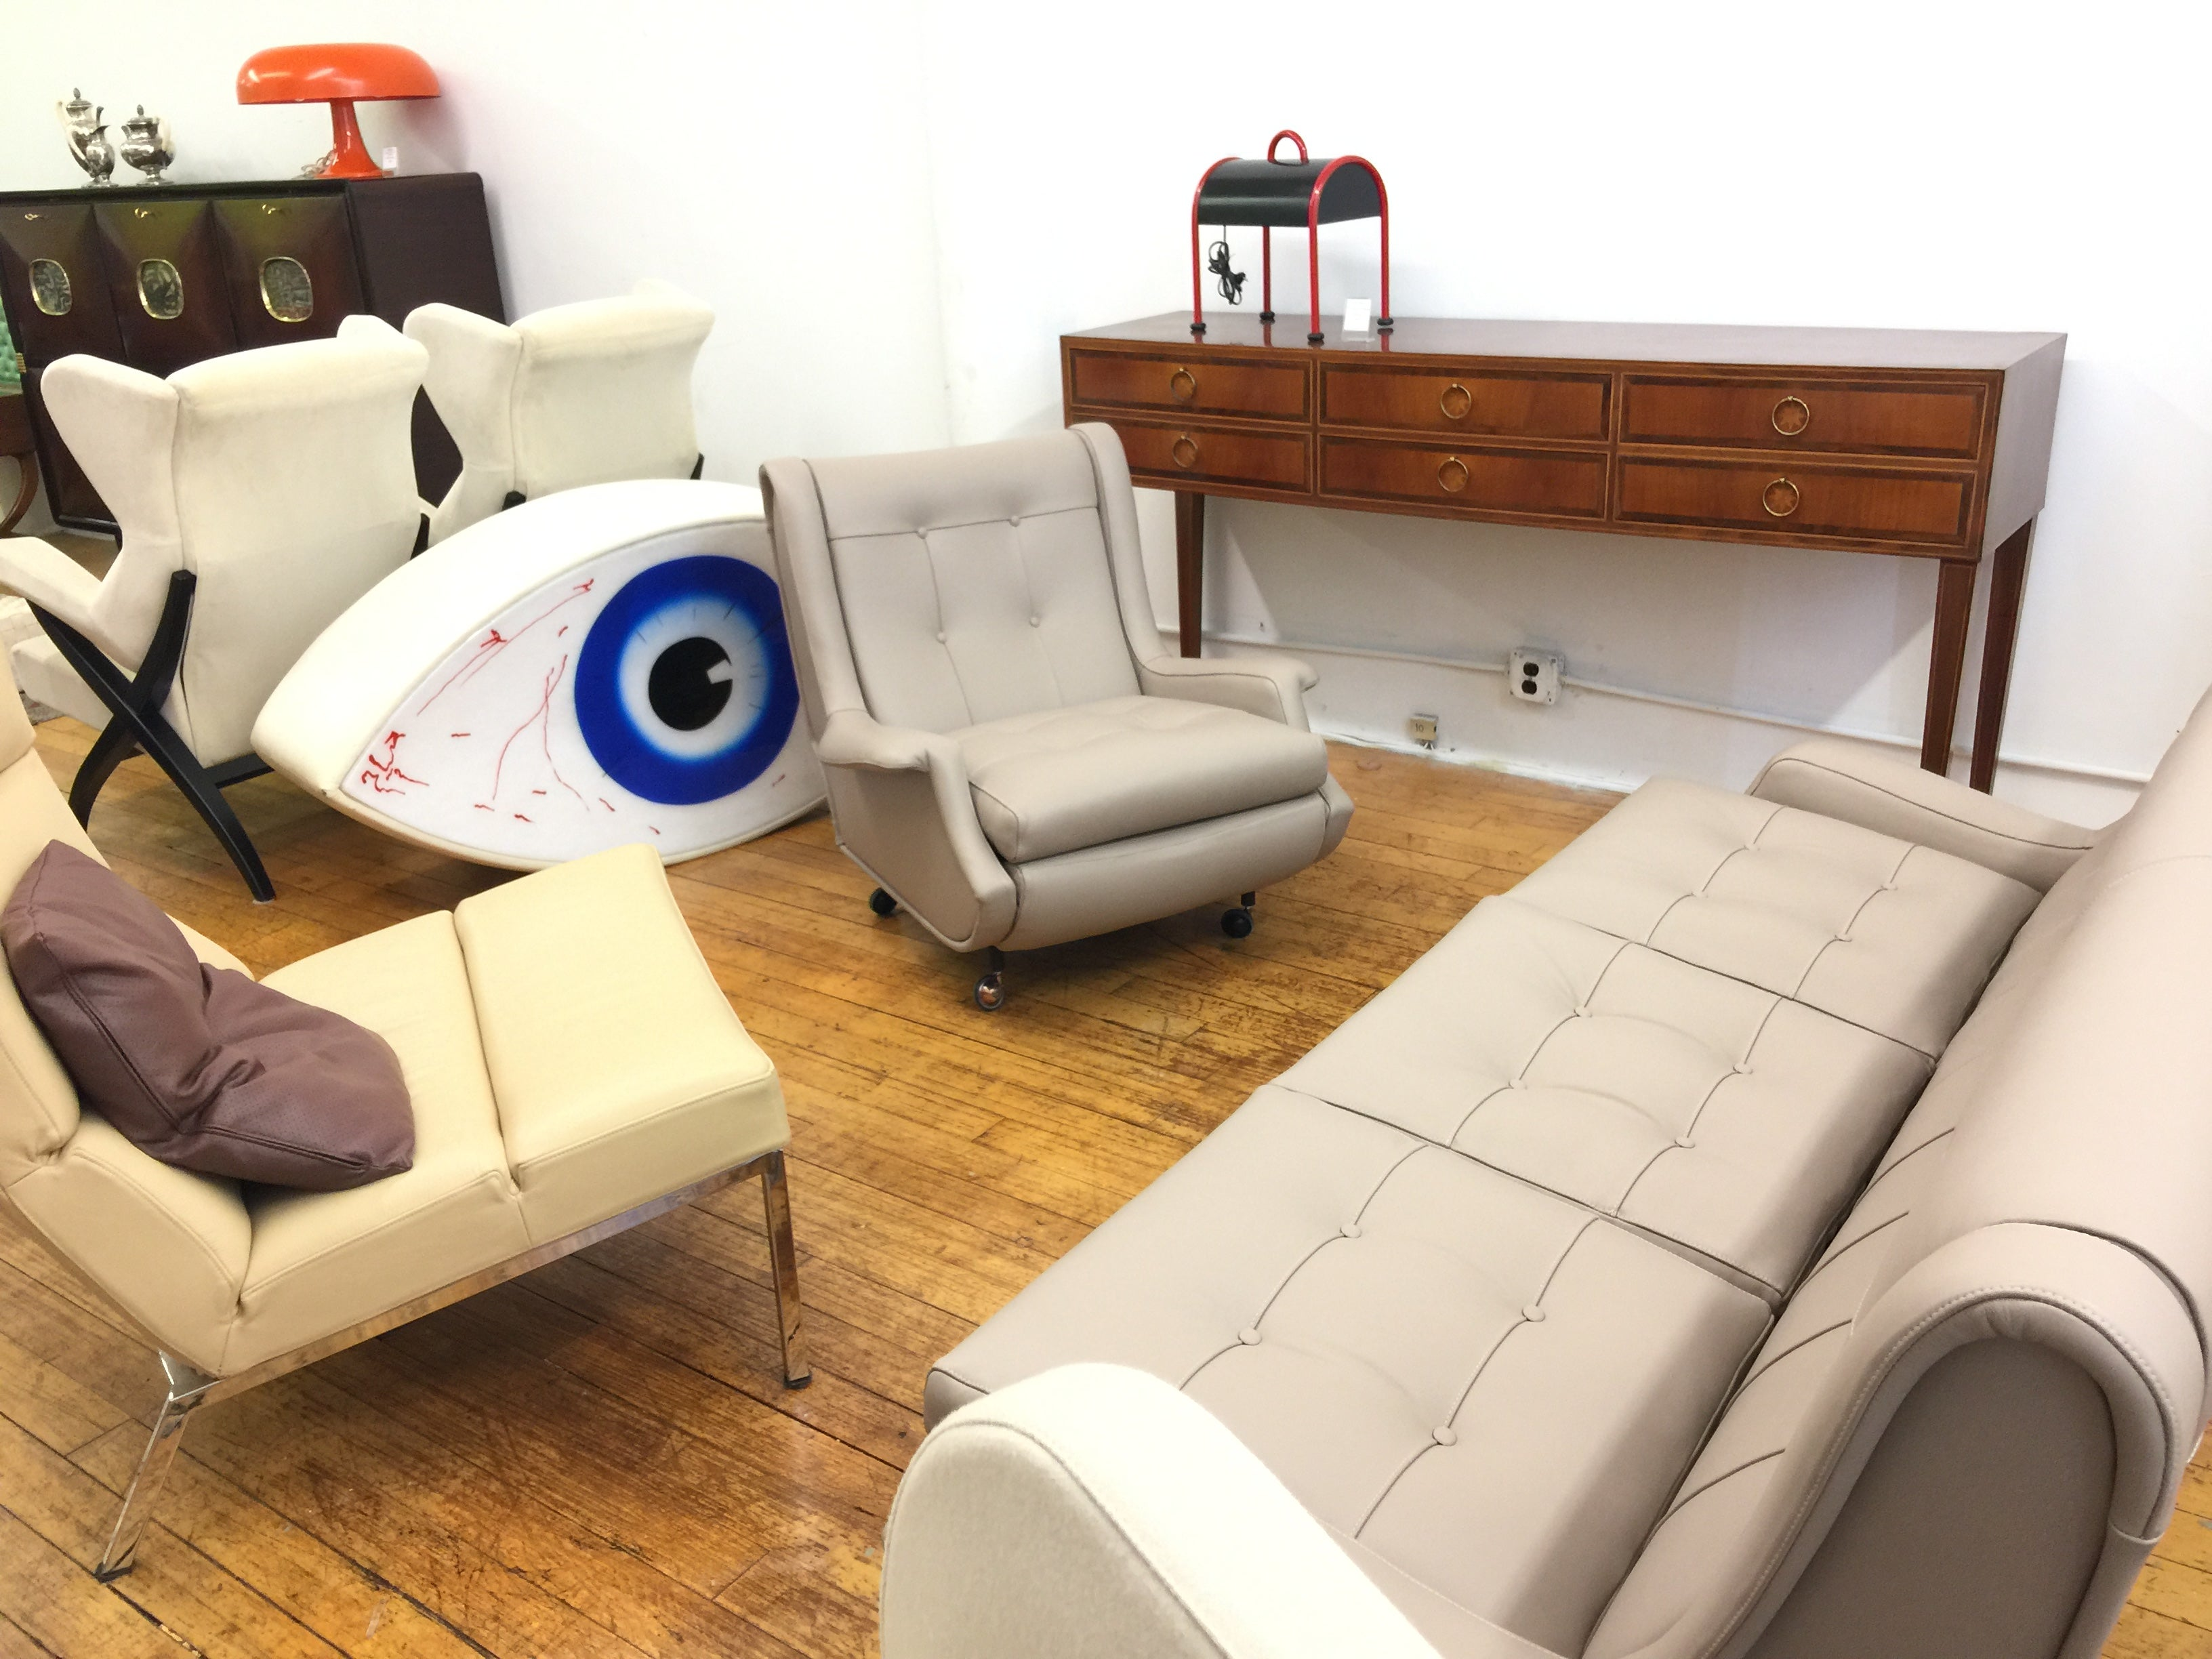 Designitalia Midcentury Modern Jersey City Nj 07307